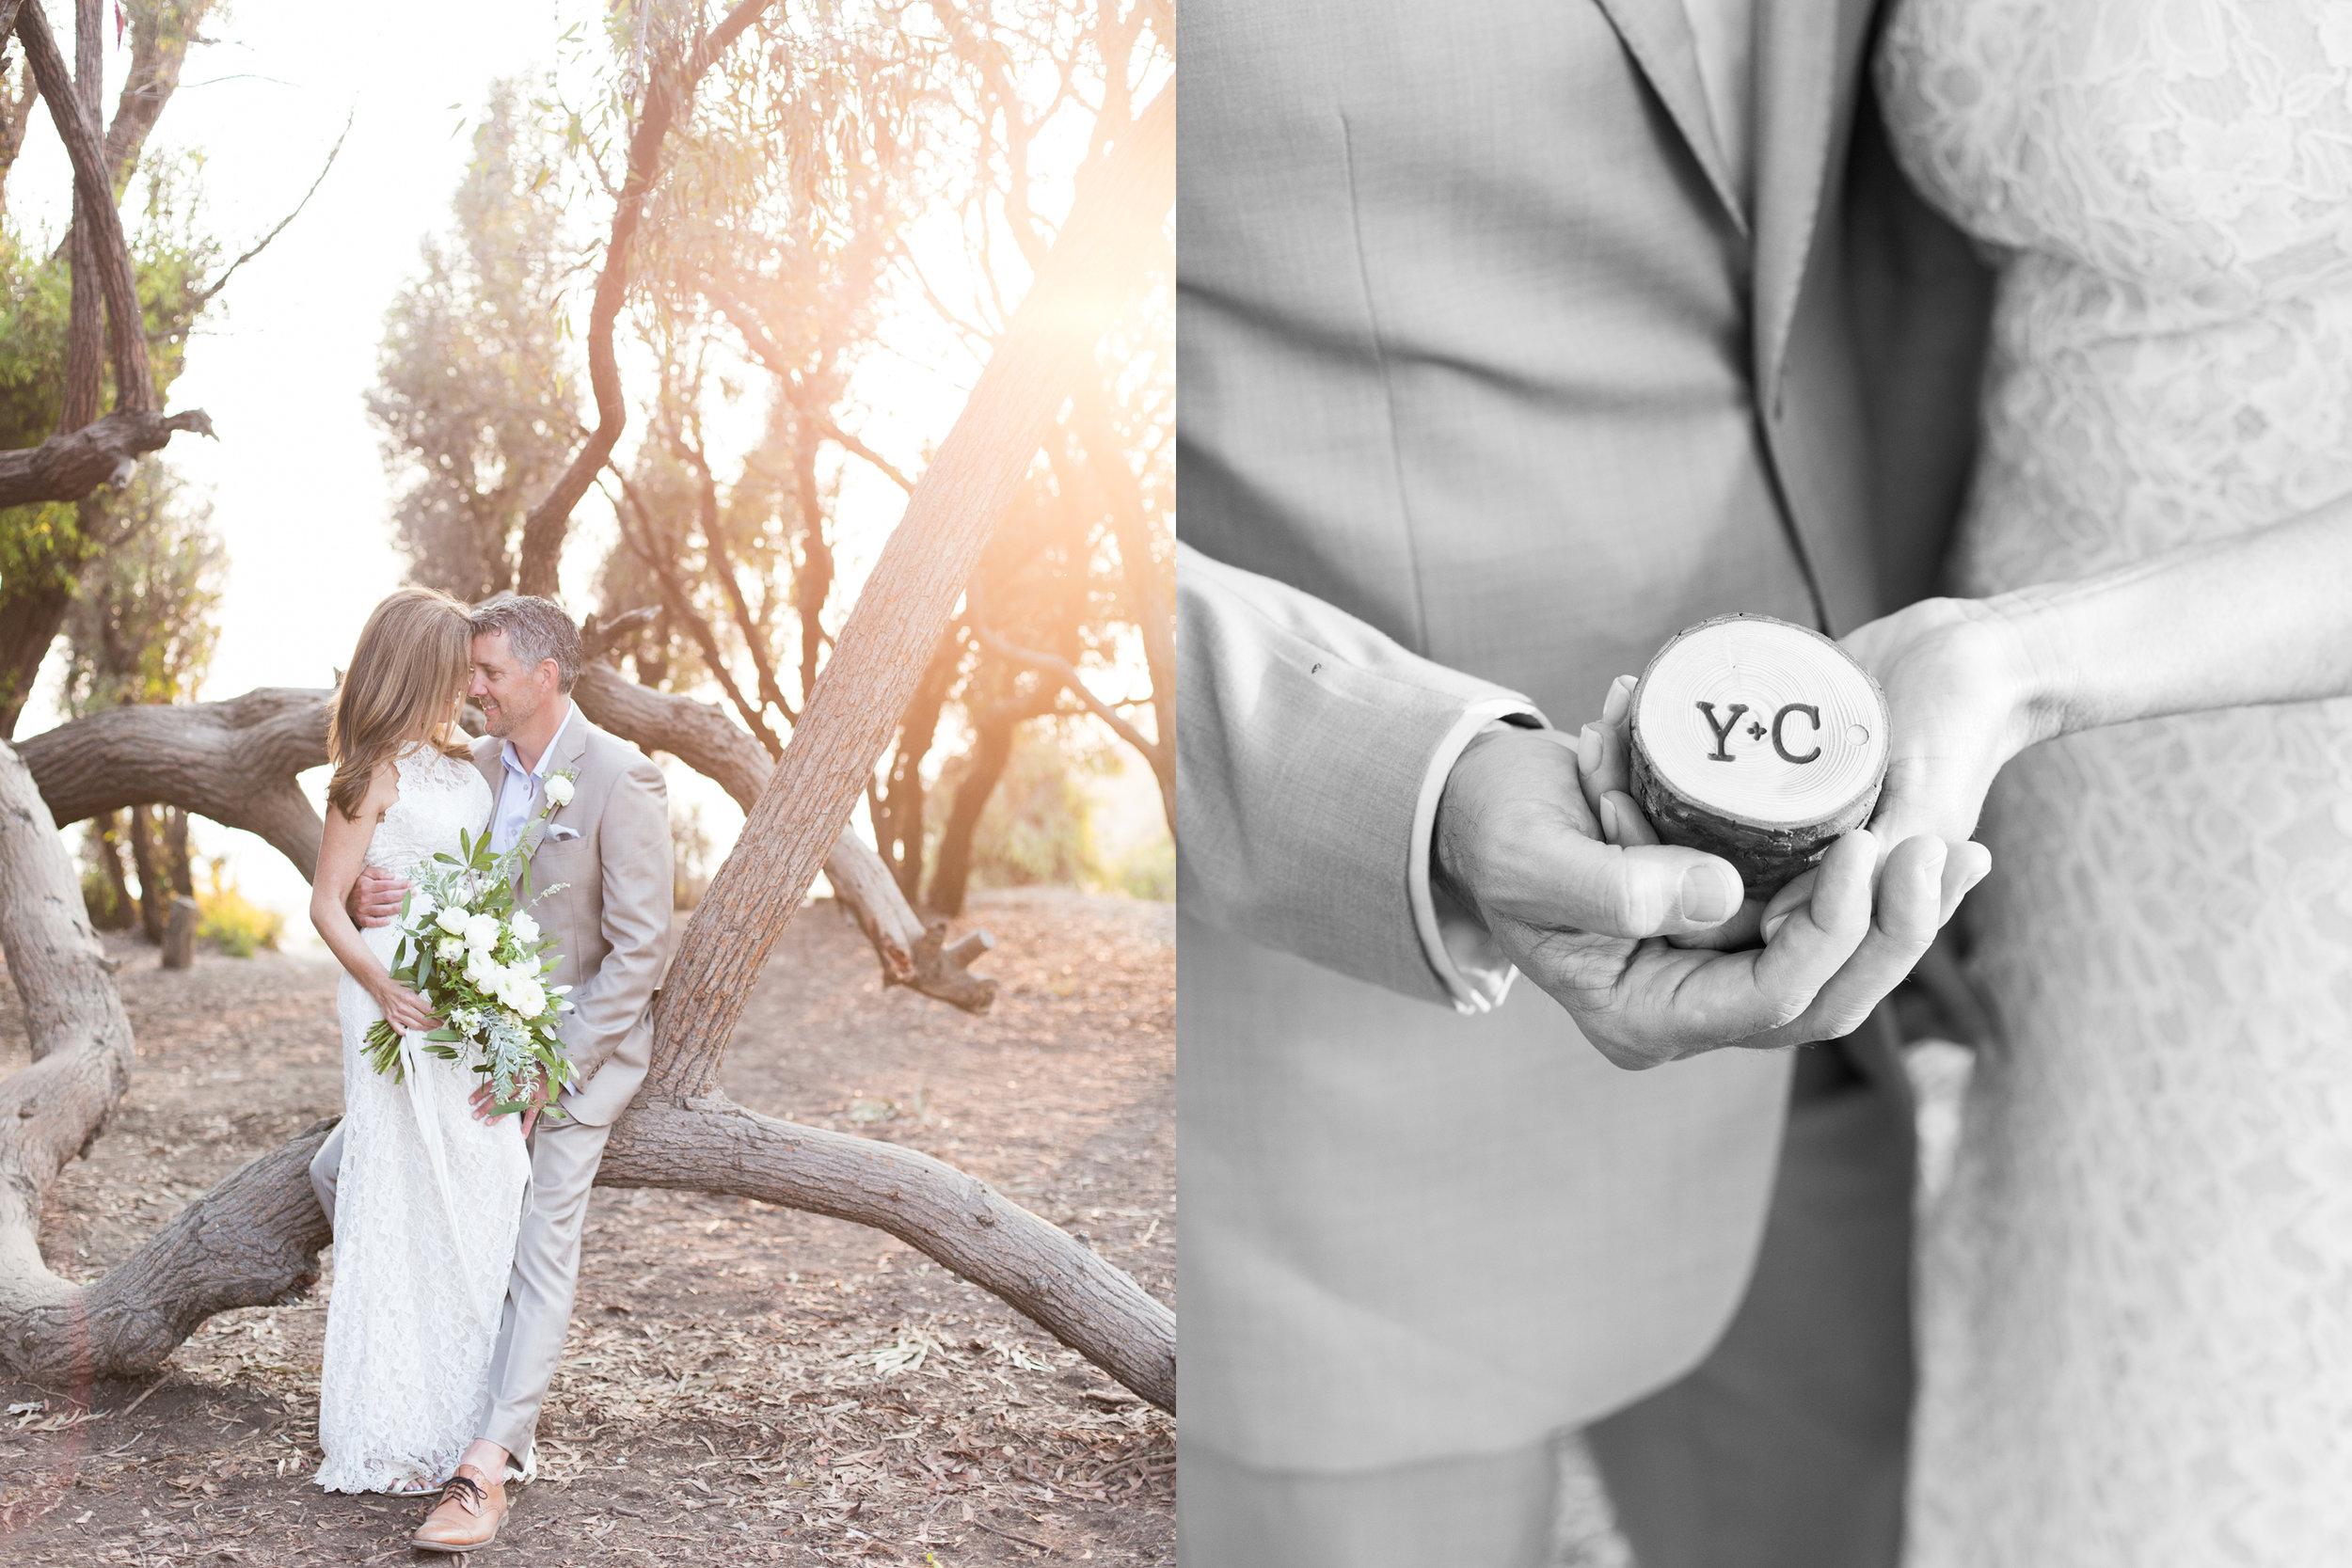 santa-barbara-elopement-elope-wedding-planner-coordinator-coordination-day-of-intimate-rustic-ellwood-bluffs-forest-beach-ocean-view-green-white-event (13).jpg